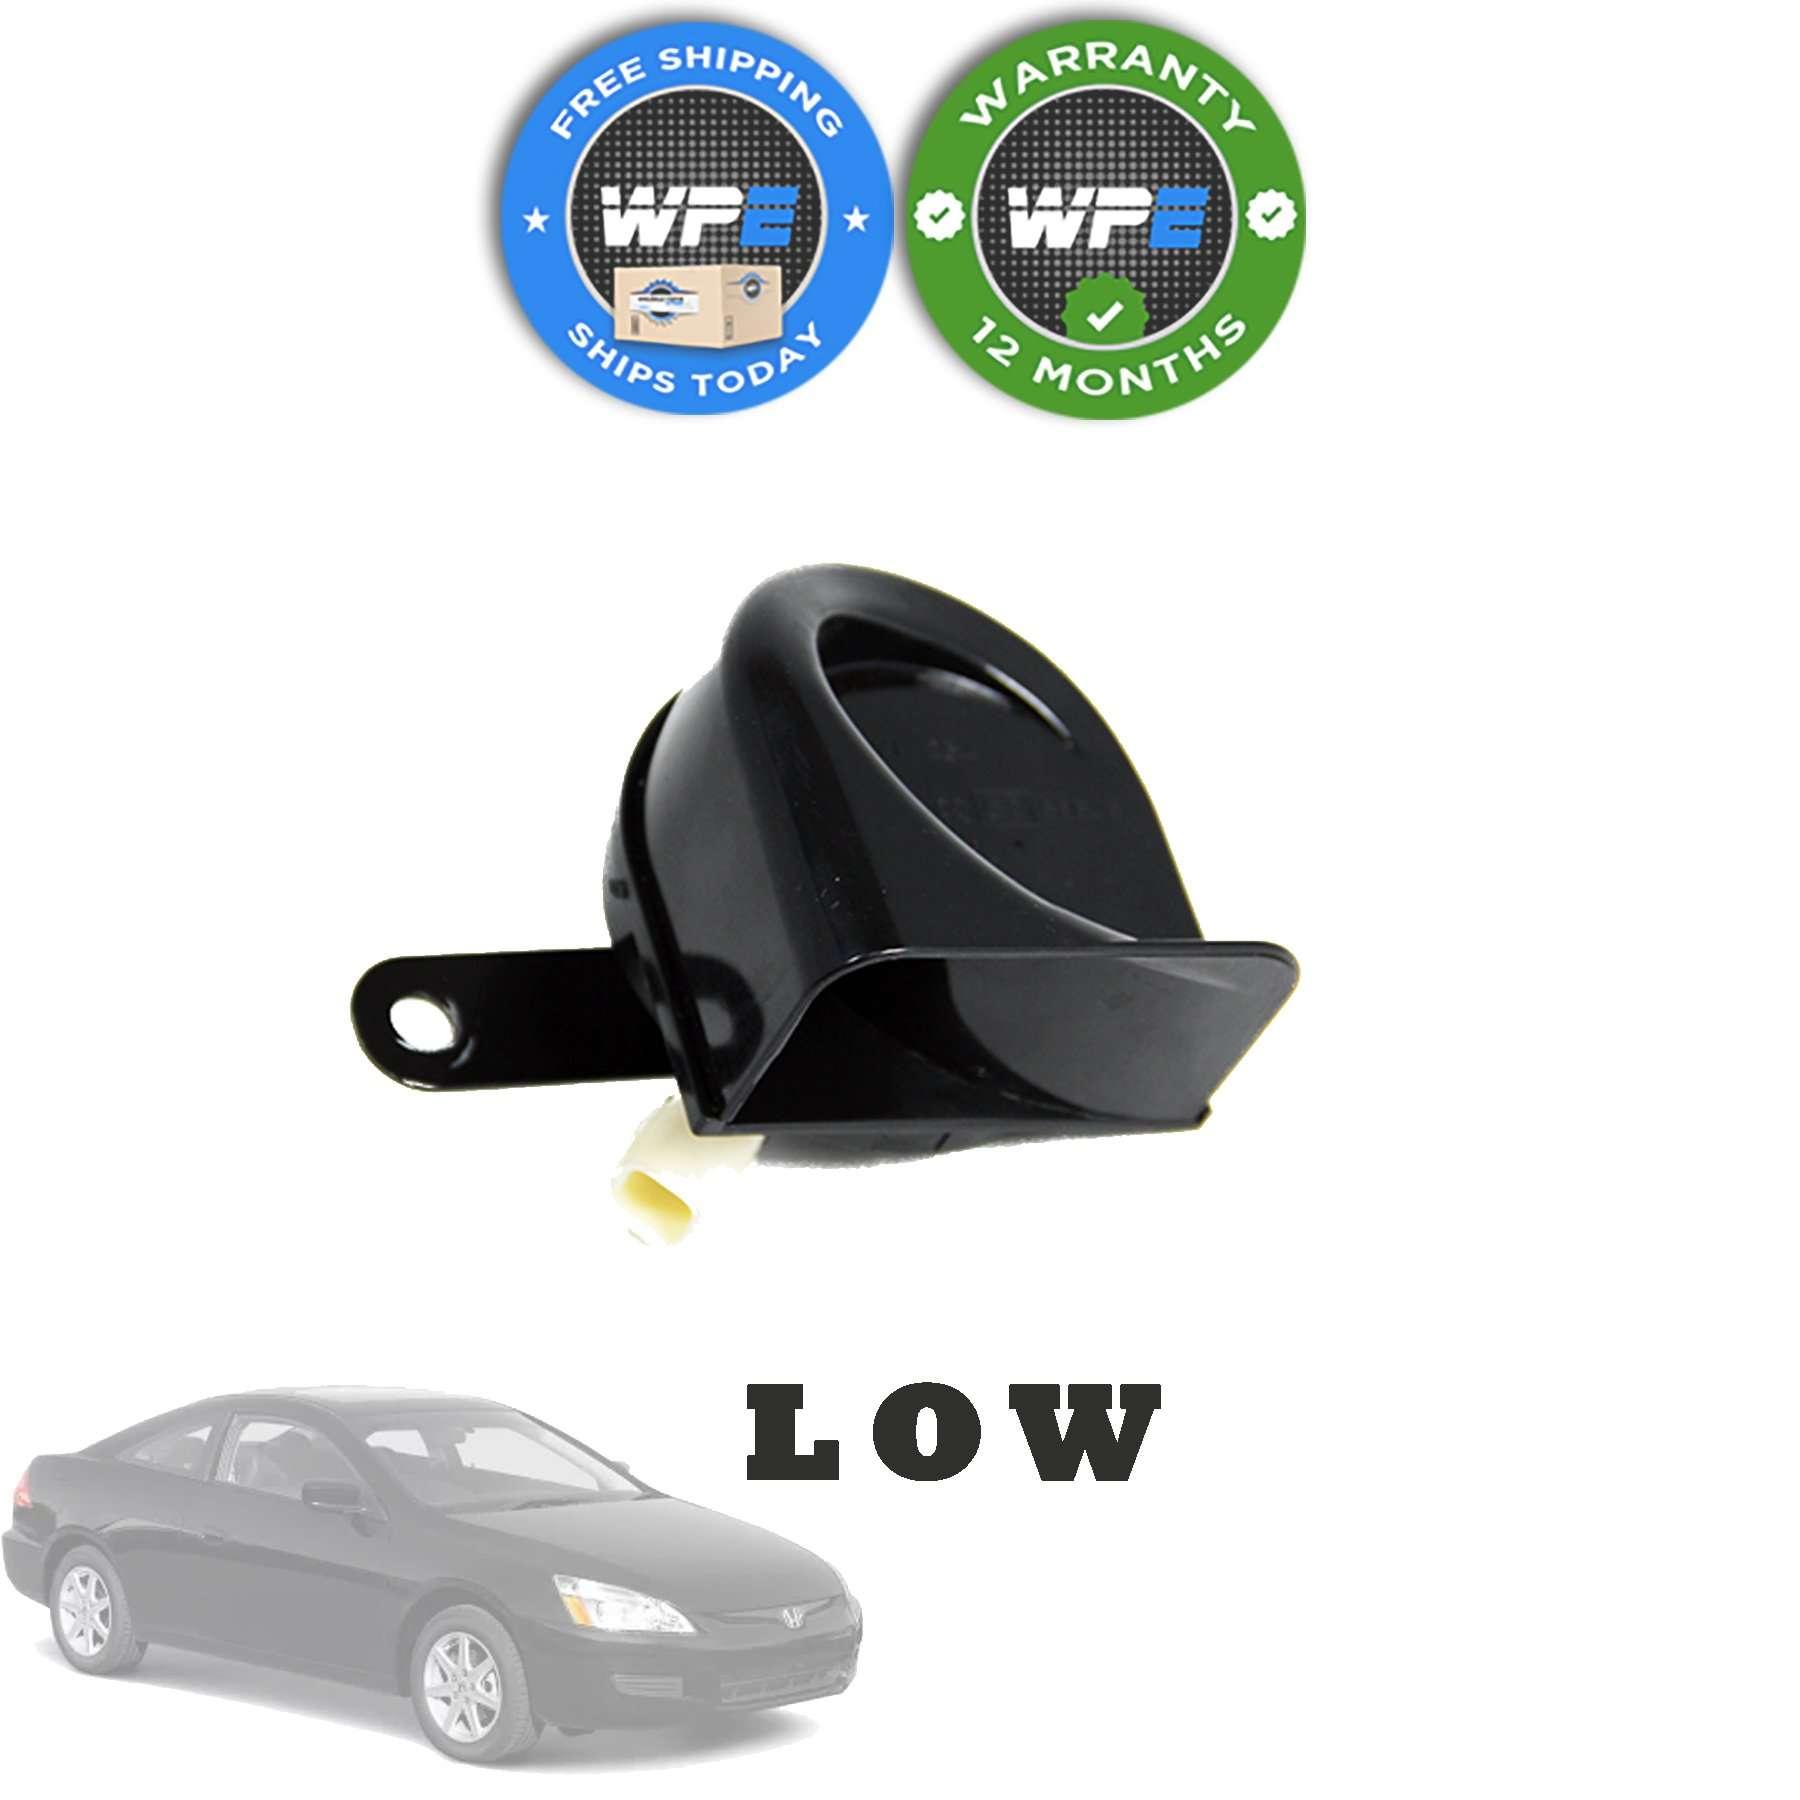 Horns For Honda Accord And Acura TSX RL 38100-38150 SDB